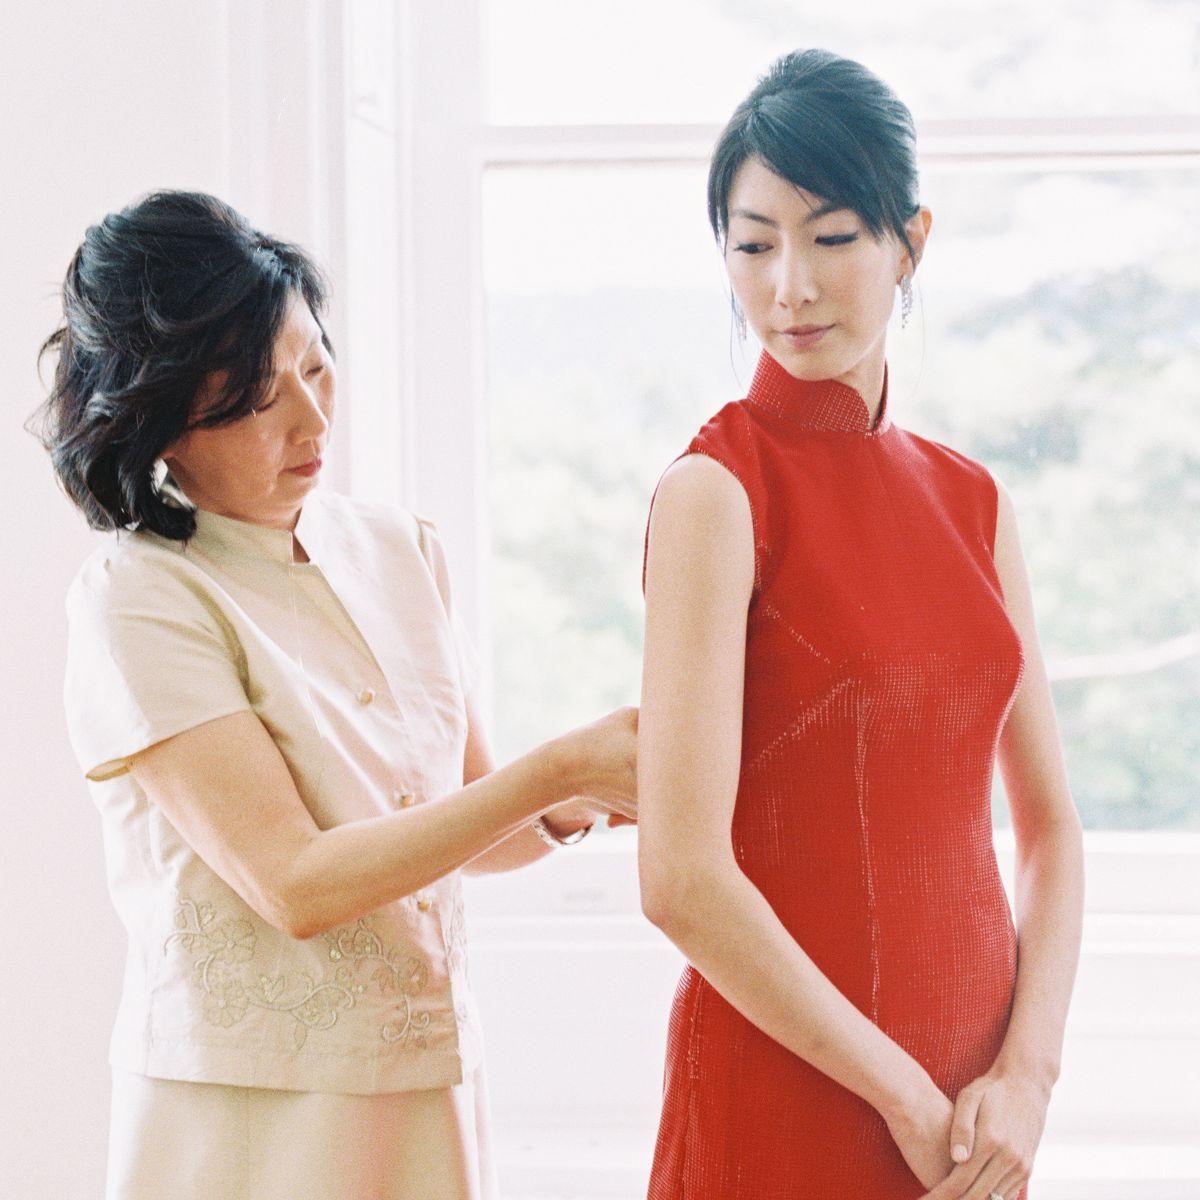 Mom zipping bride into red dress